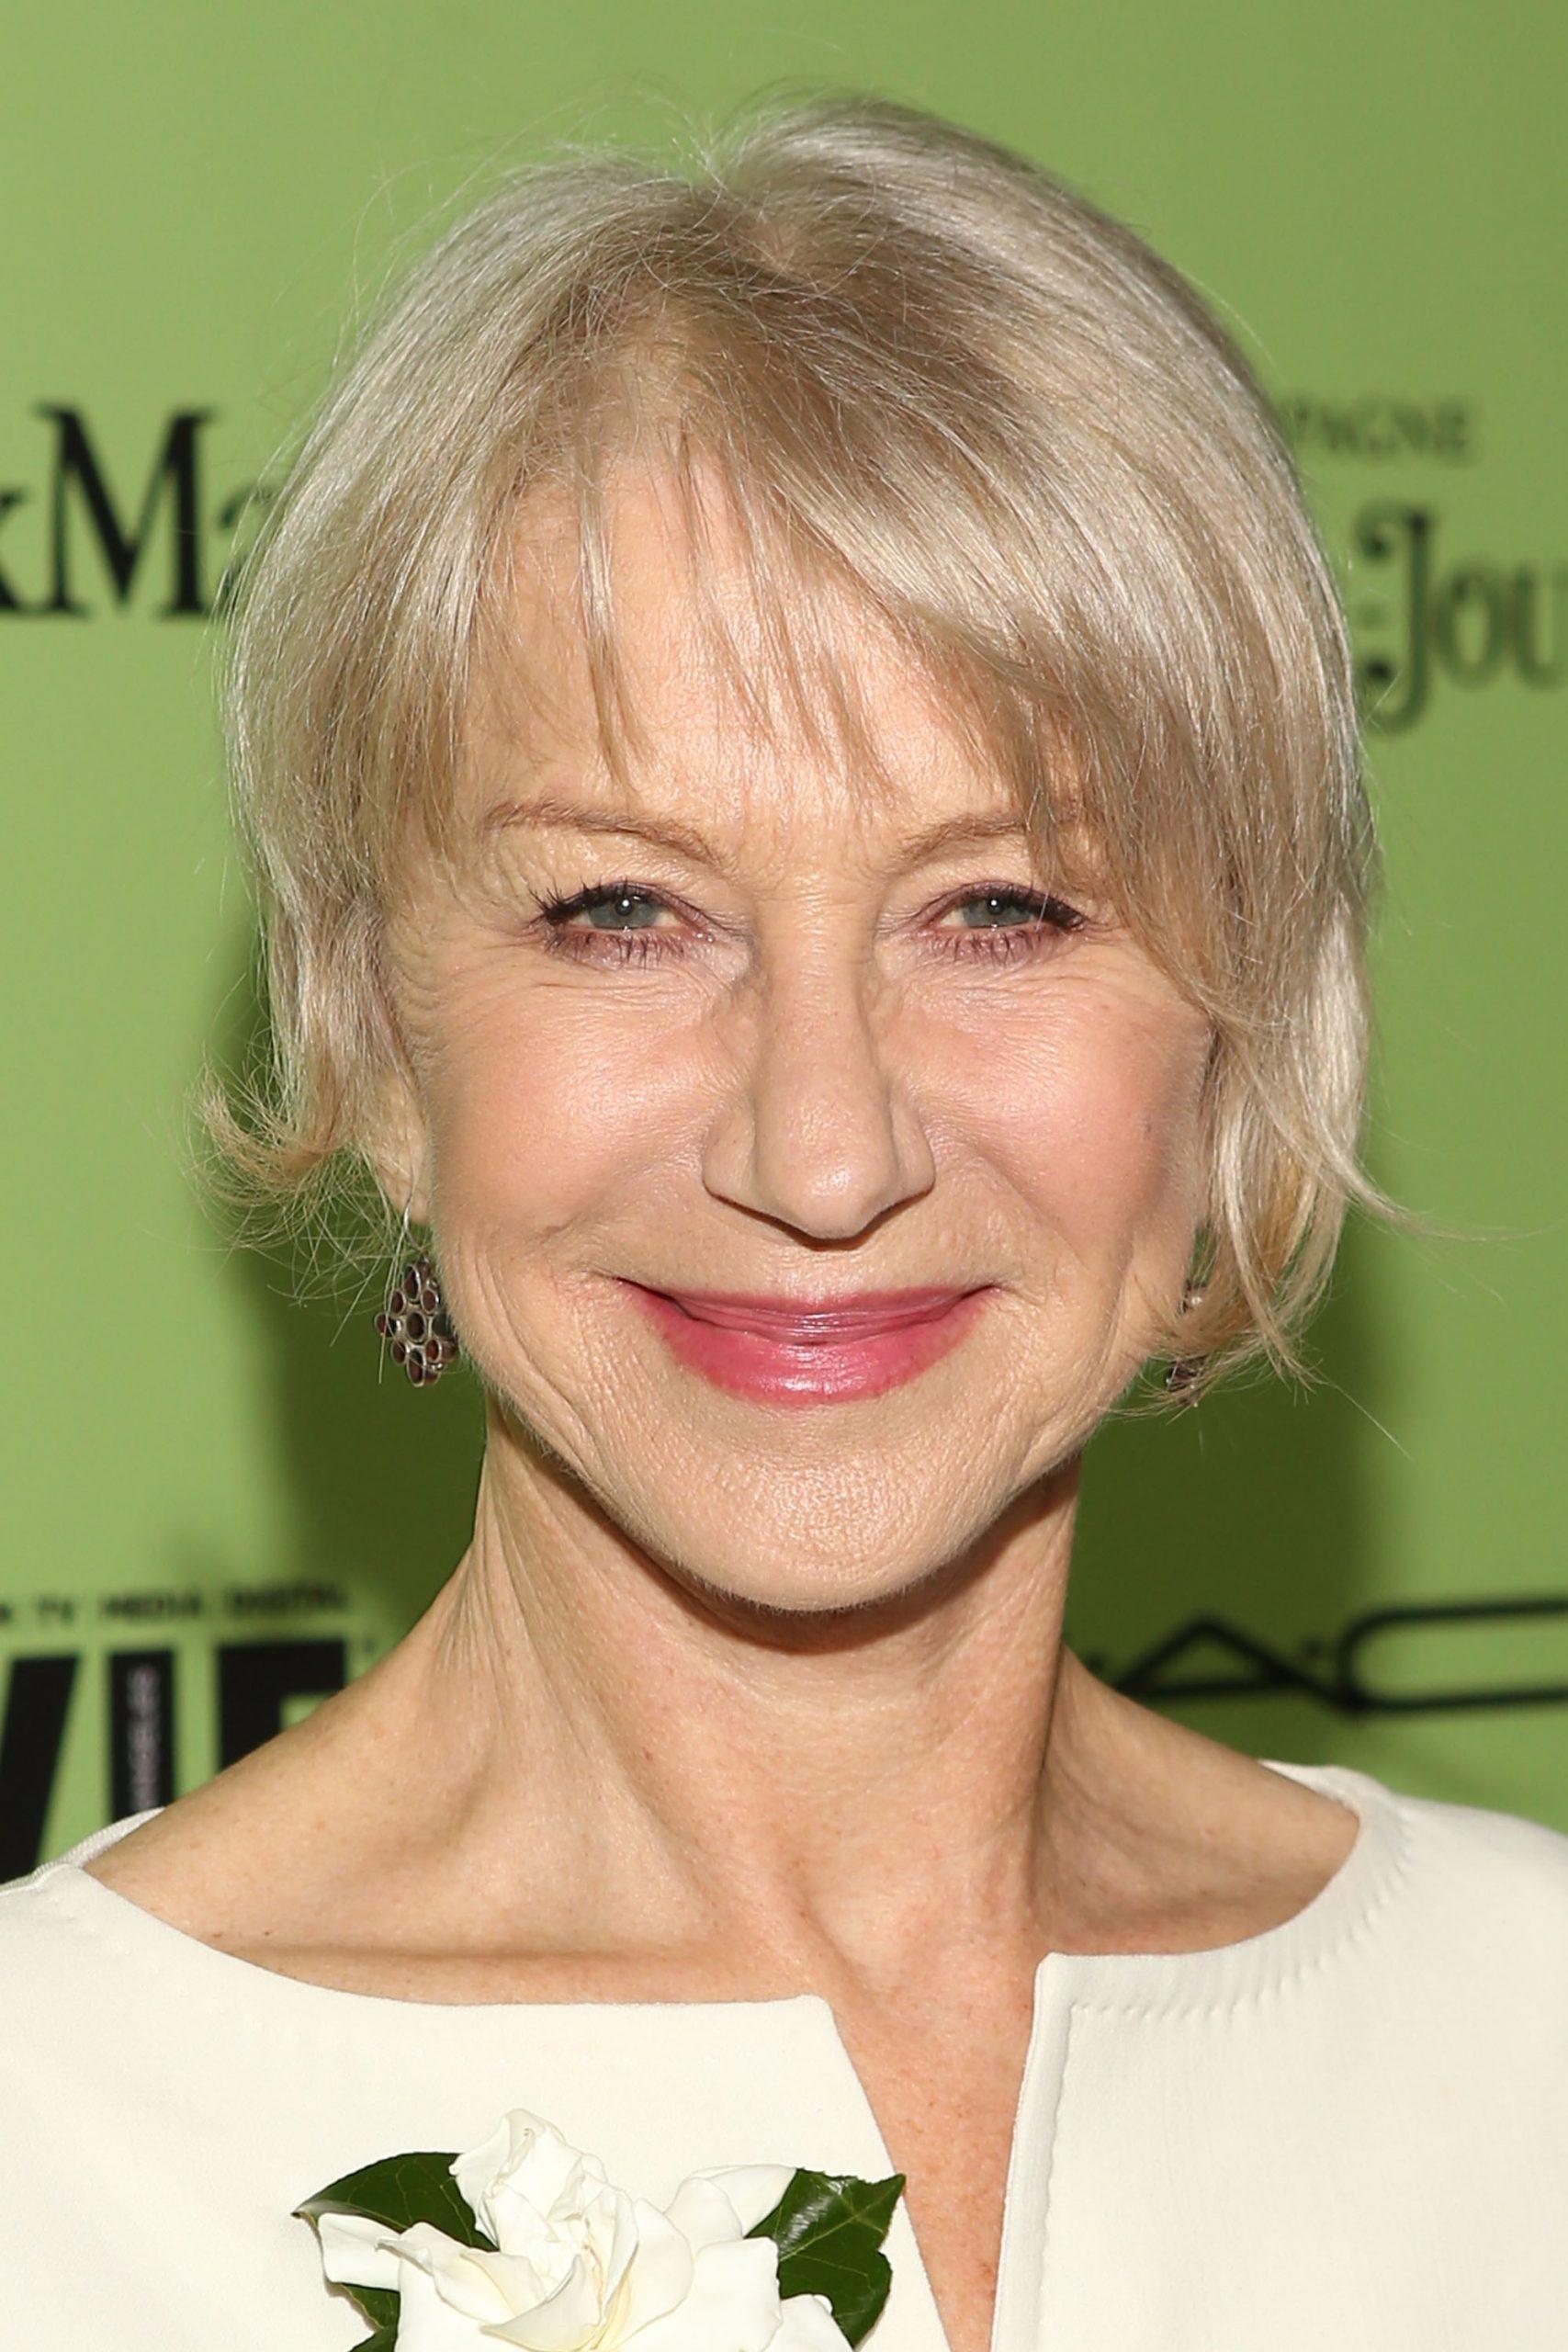 Aging gracefully: Helen Mirren